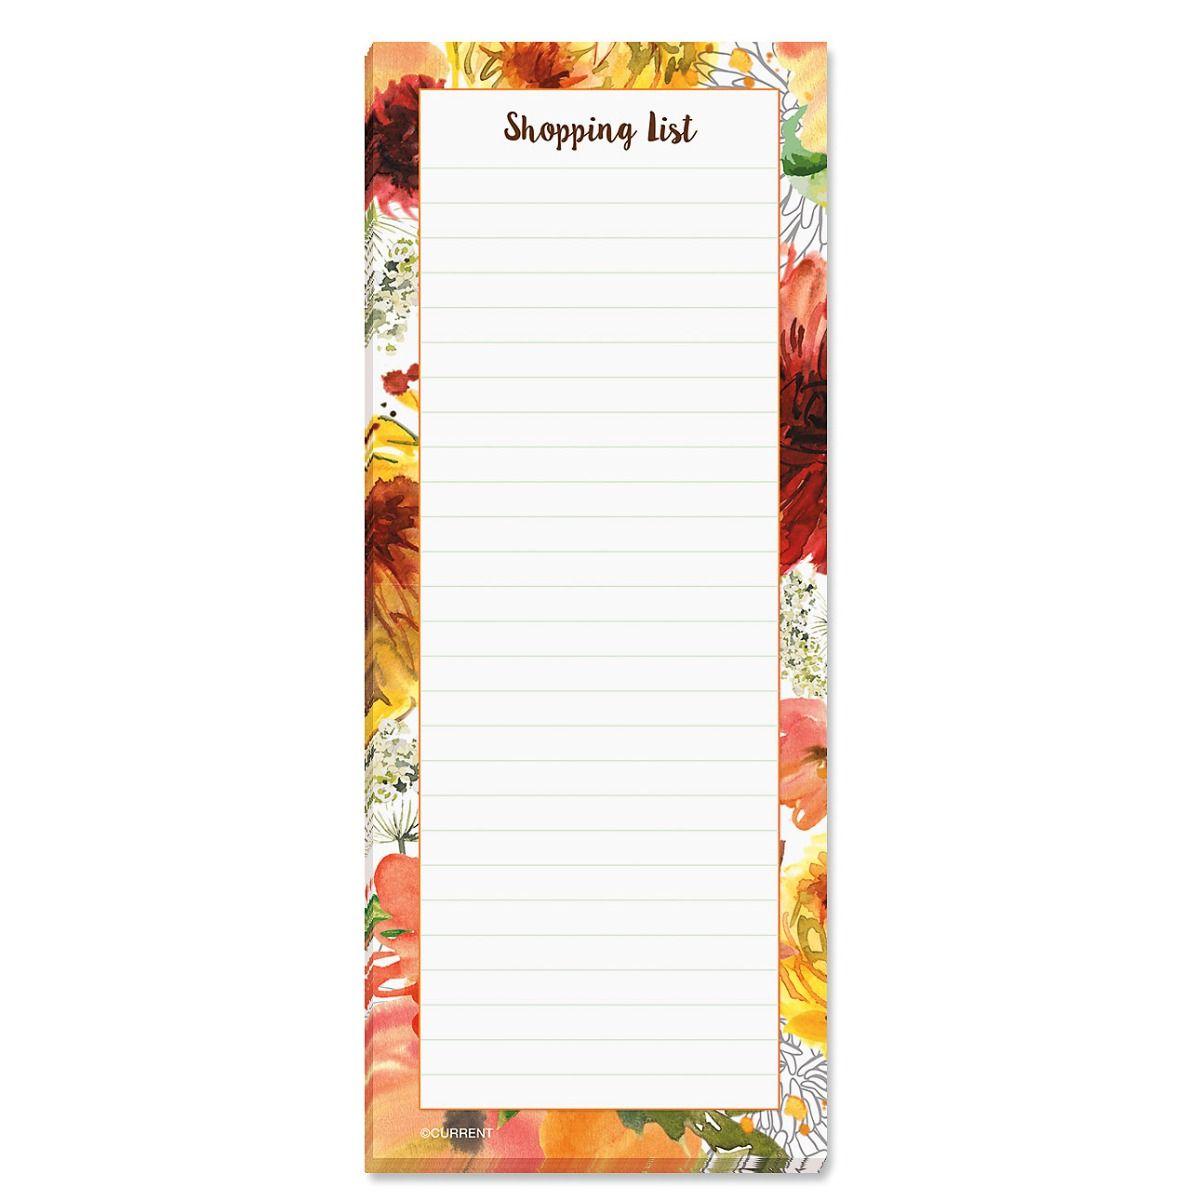 Mums Shopping List Pads - BOGO